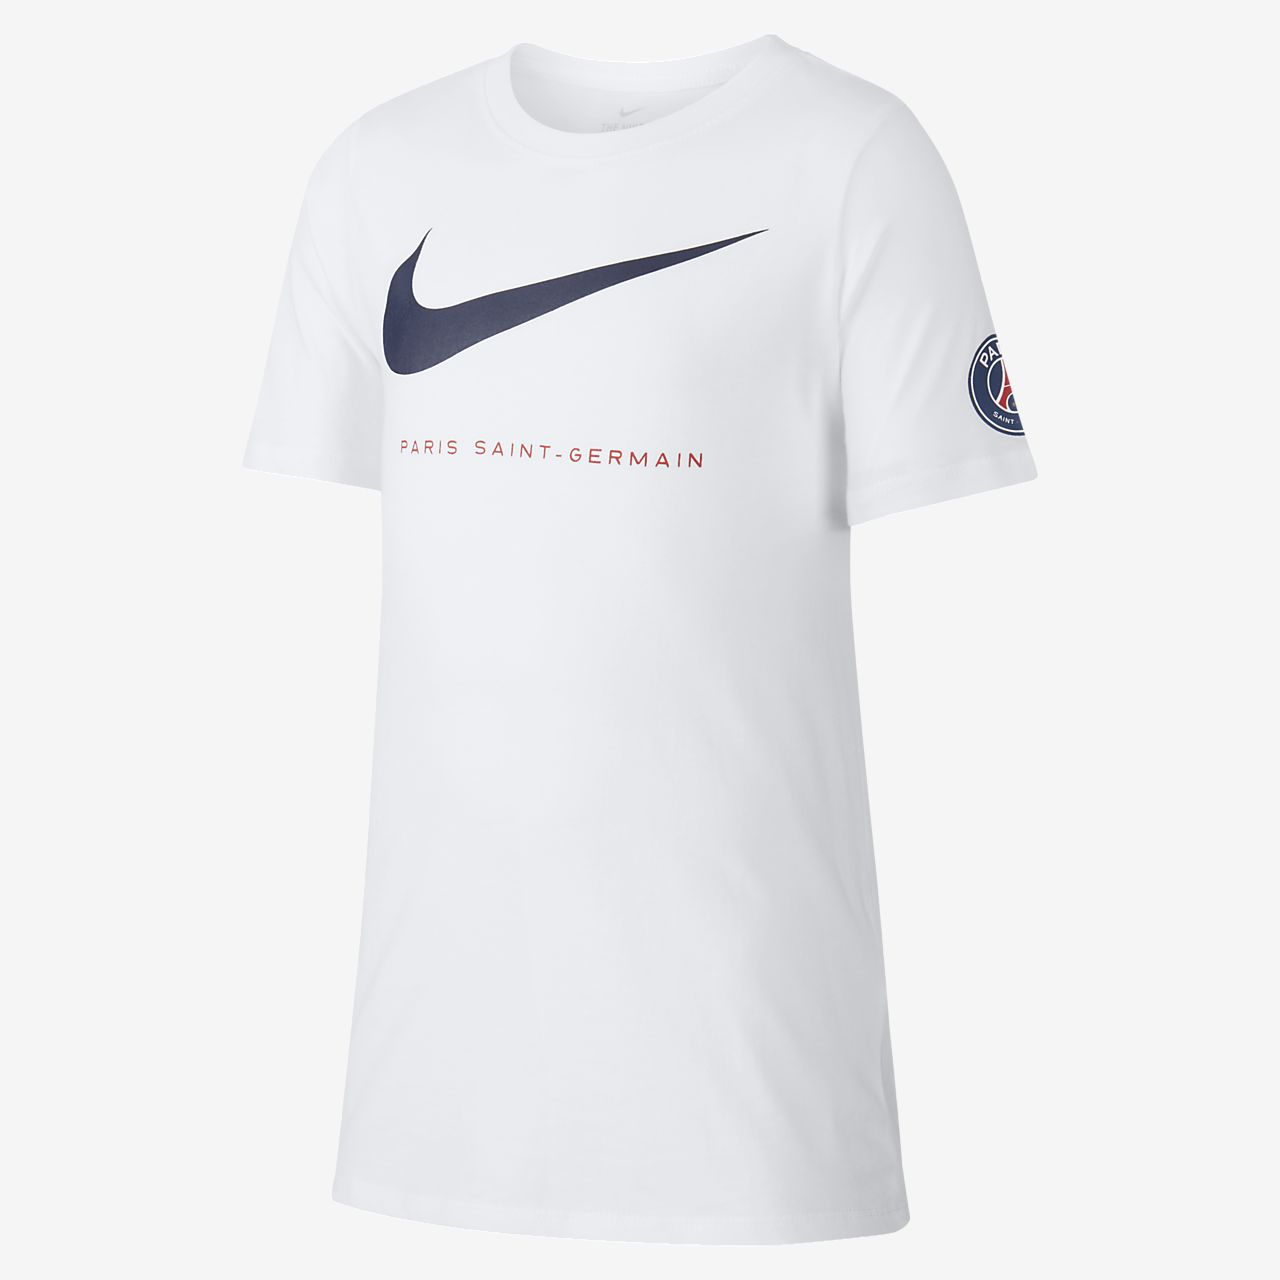 Playera para niño talla grande Paris Saint-Germain